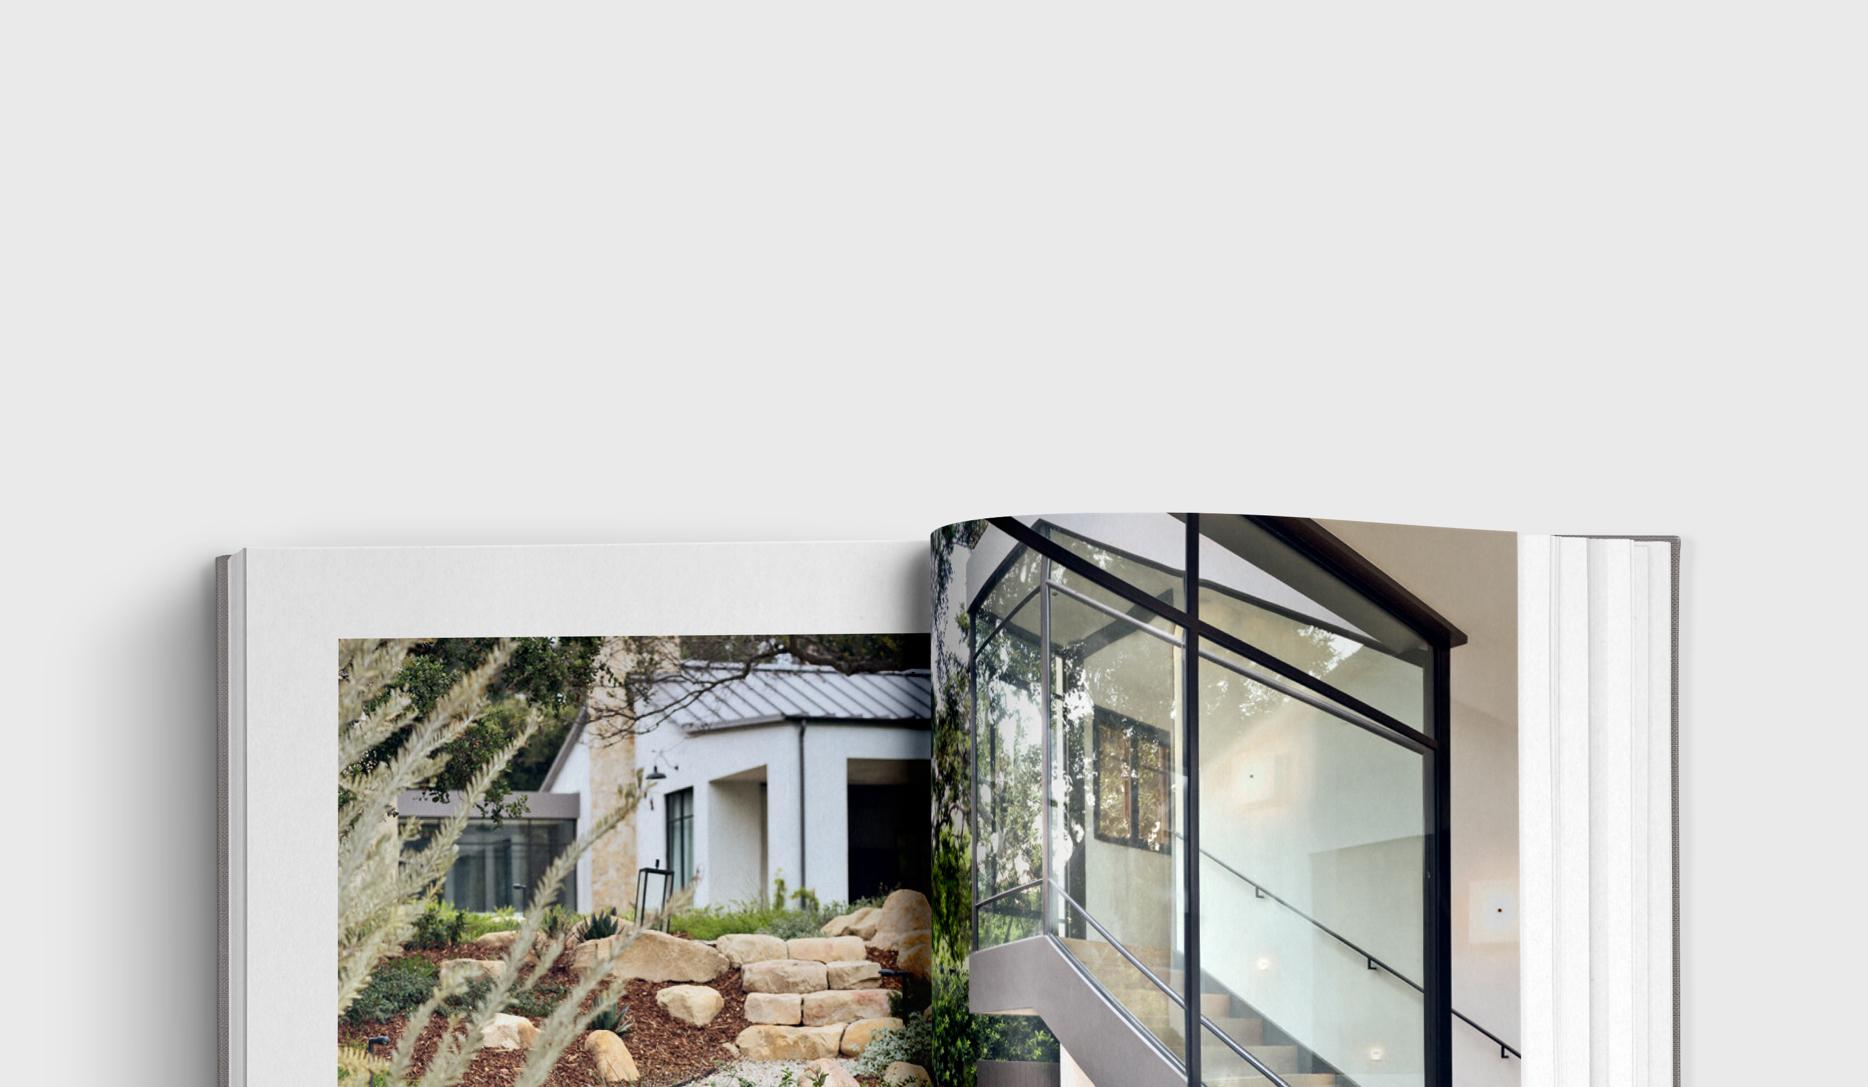 william_hefner_books_4-california-homes-II